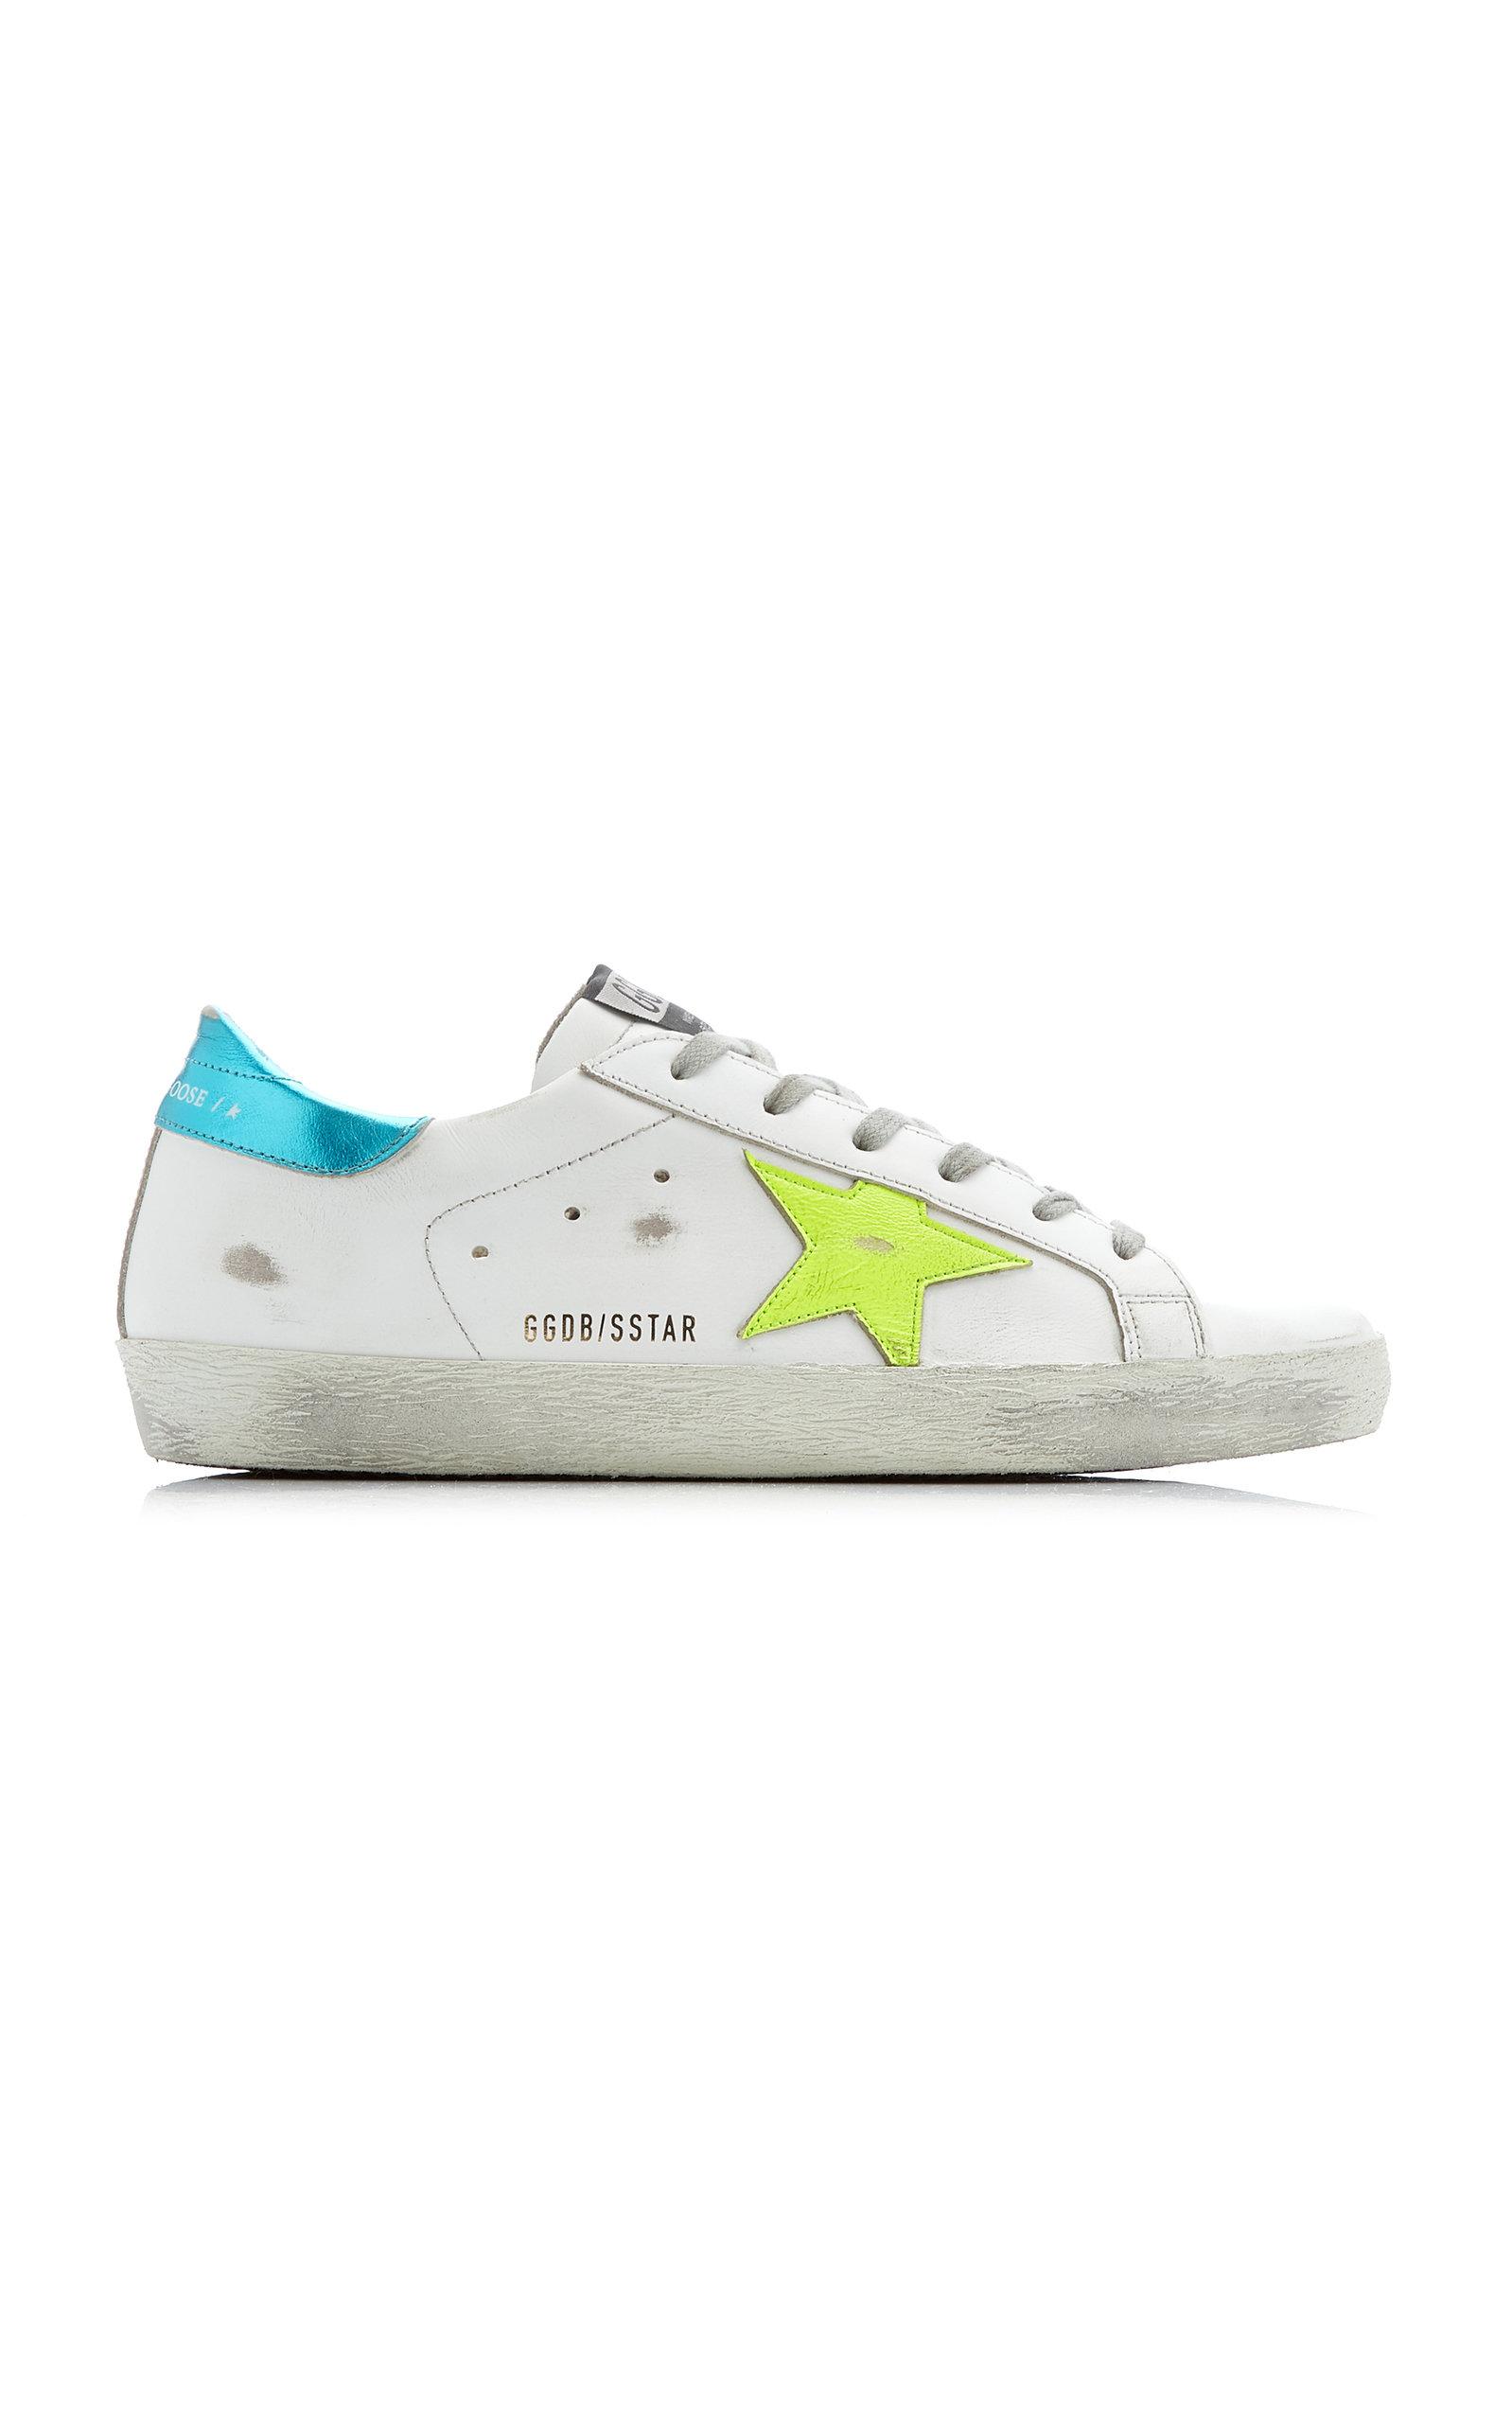 Golden Goose - Women's Superstar Distressed Leather Sneakers - White - Moda Operandi